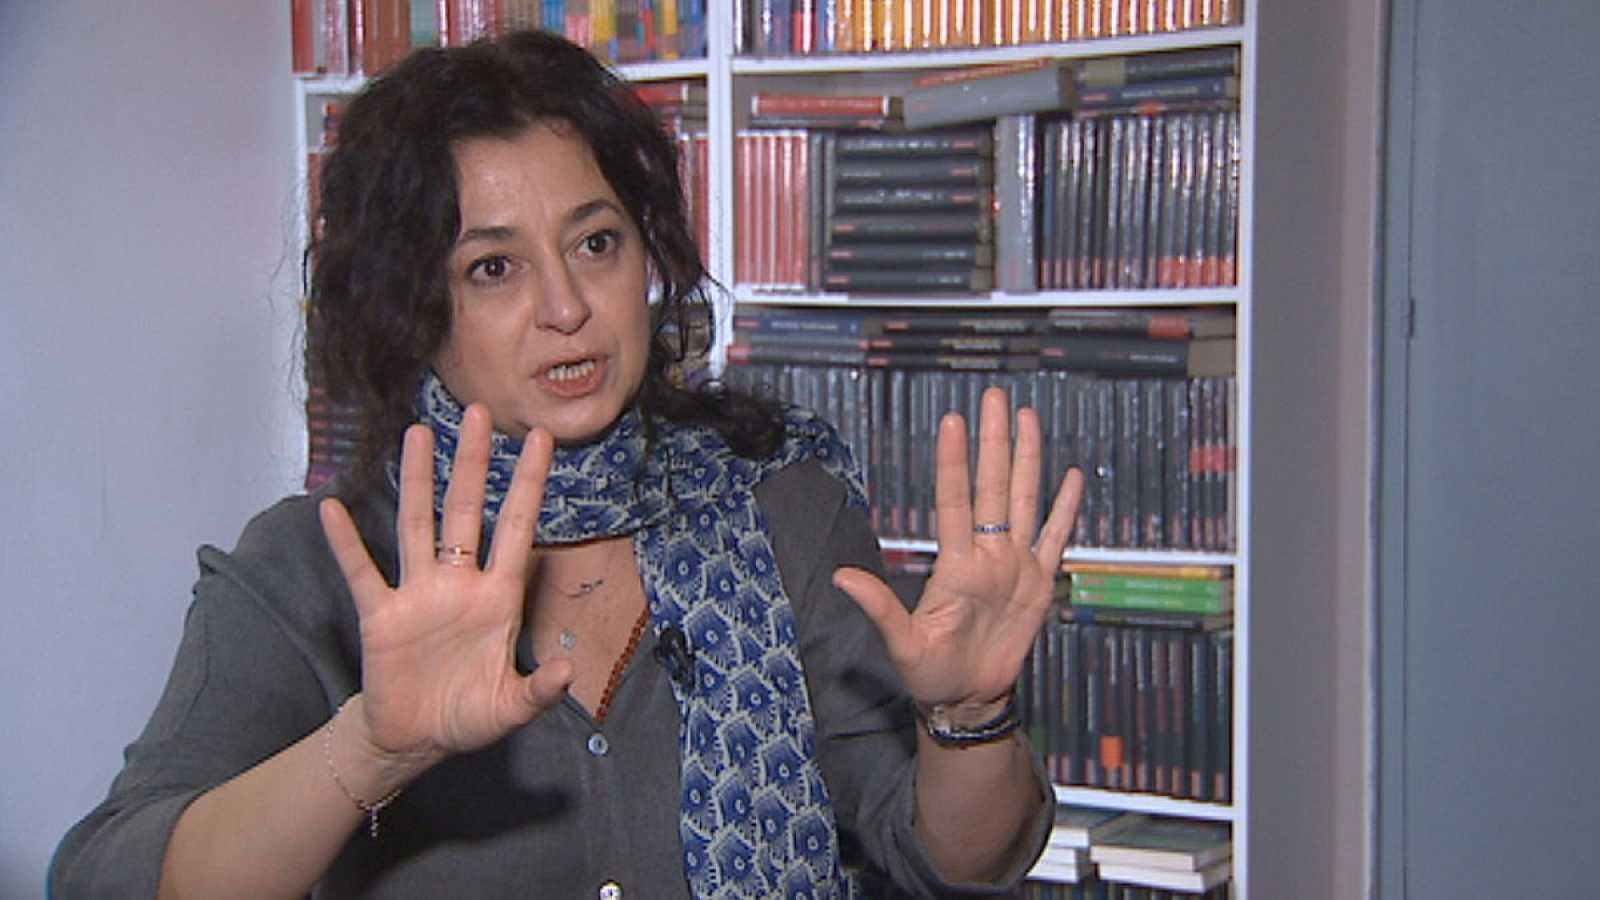 La periodista turca Ece Temelkuran